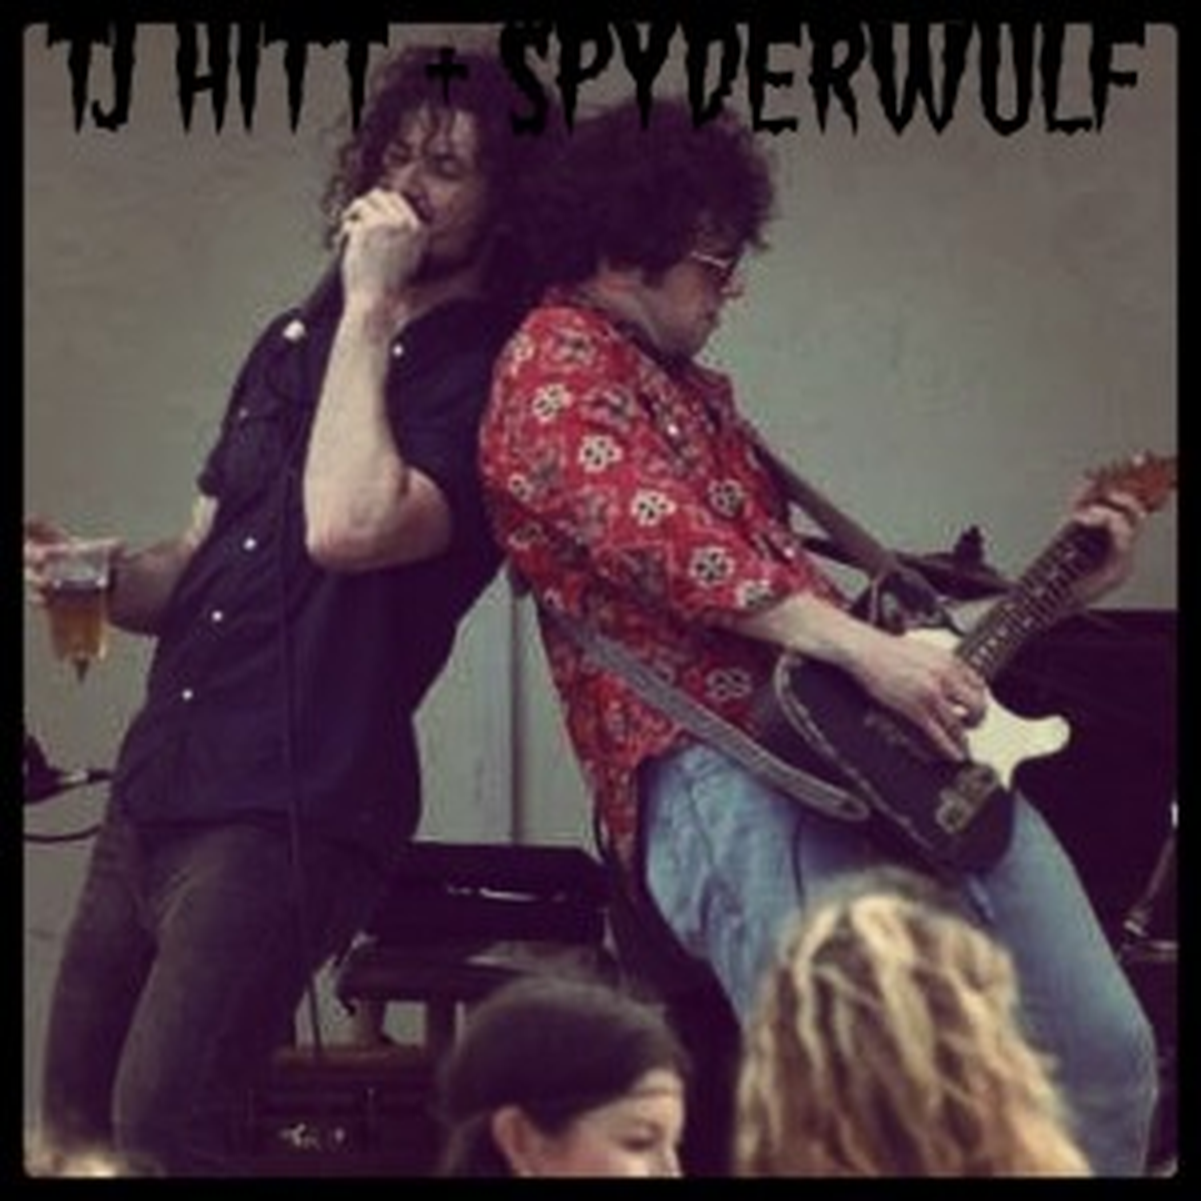 TJ HITT + SPYDERWULF wiki, TJ HITT + SPYDERWULF review, TJ HITT + SPYDERWULF history, TJ HITT + SPYDERWULF news